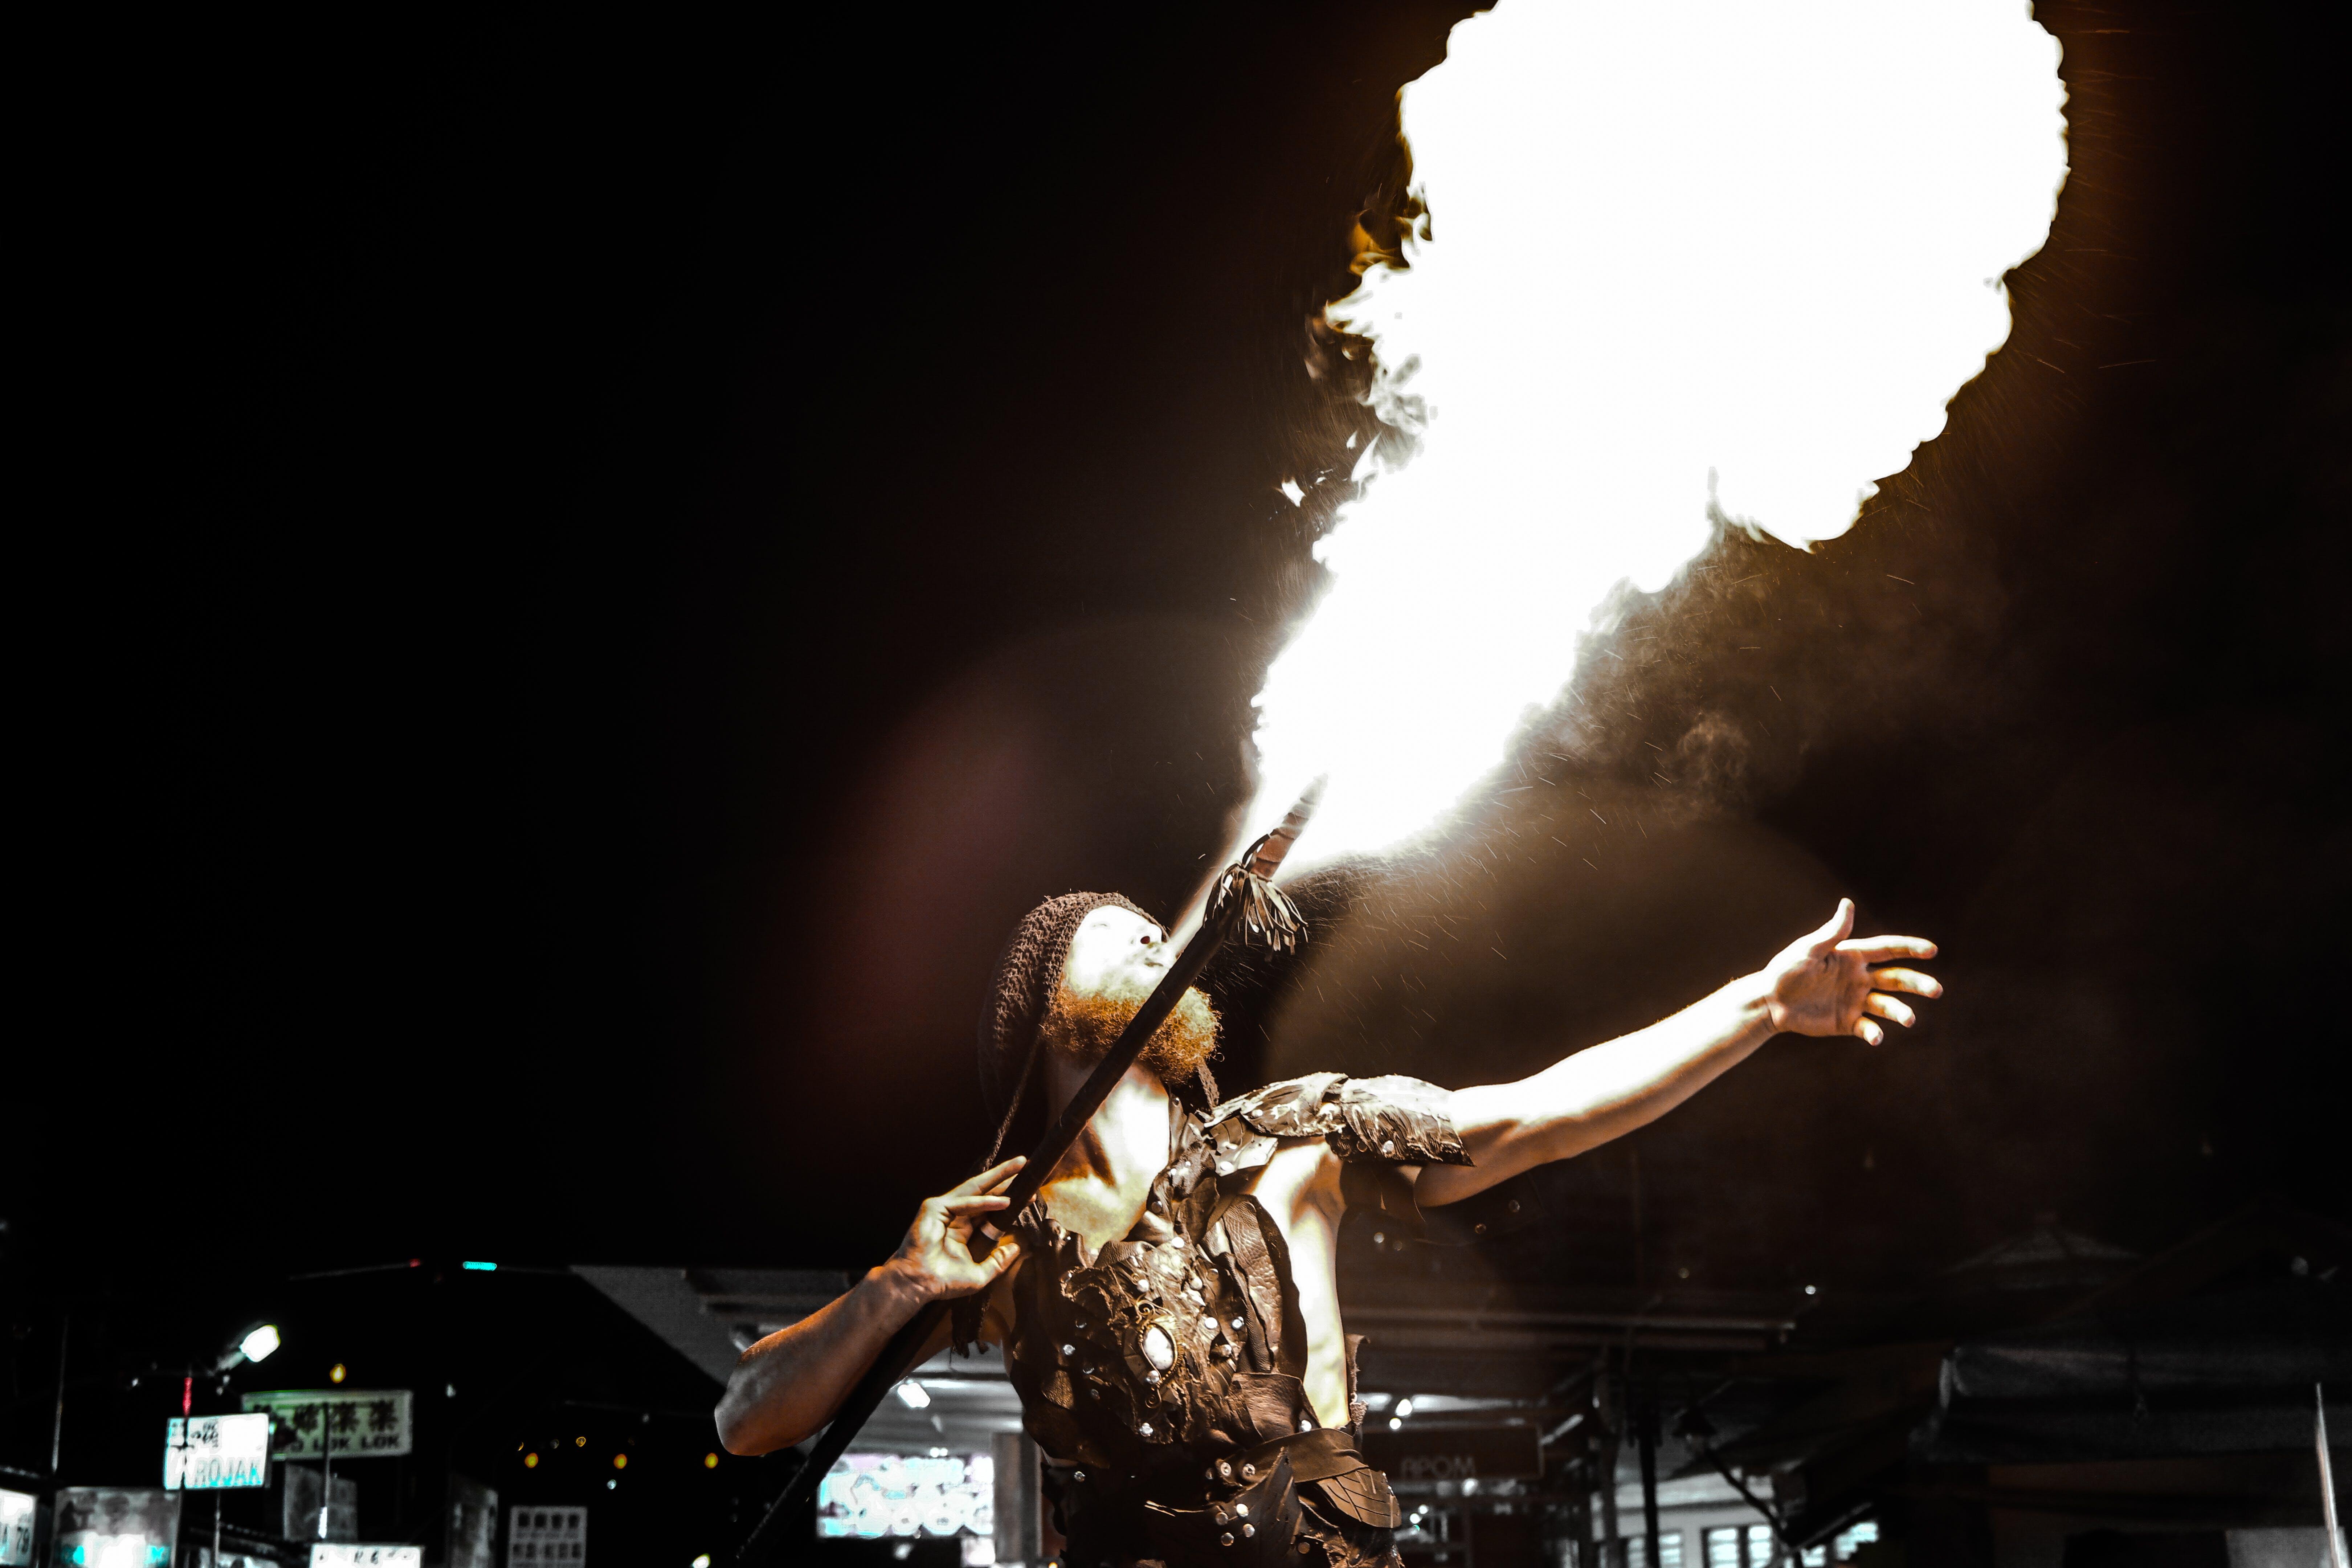 Man Spitting Fire at Nighttime